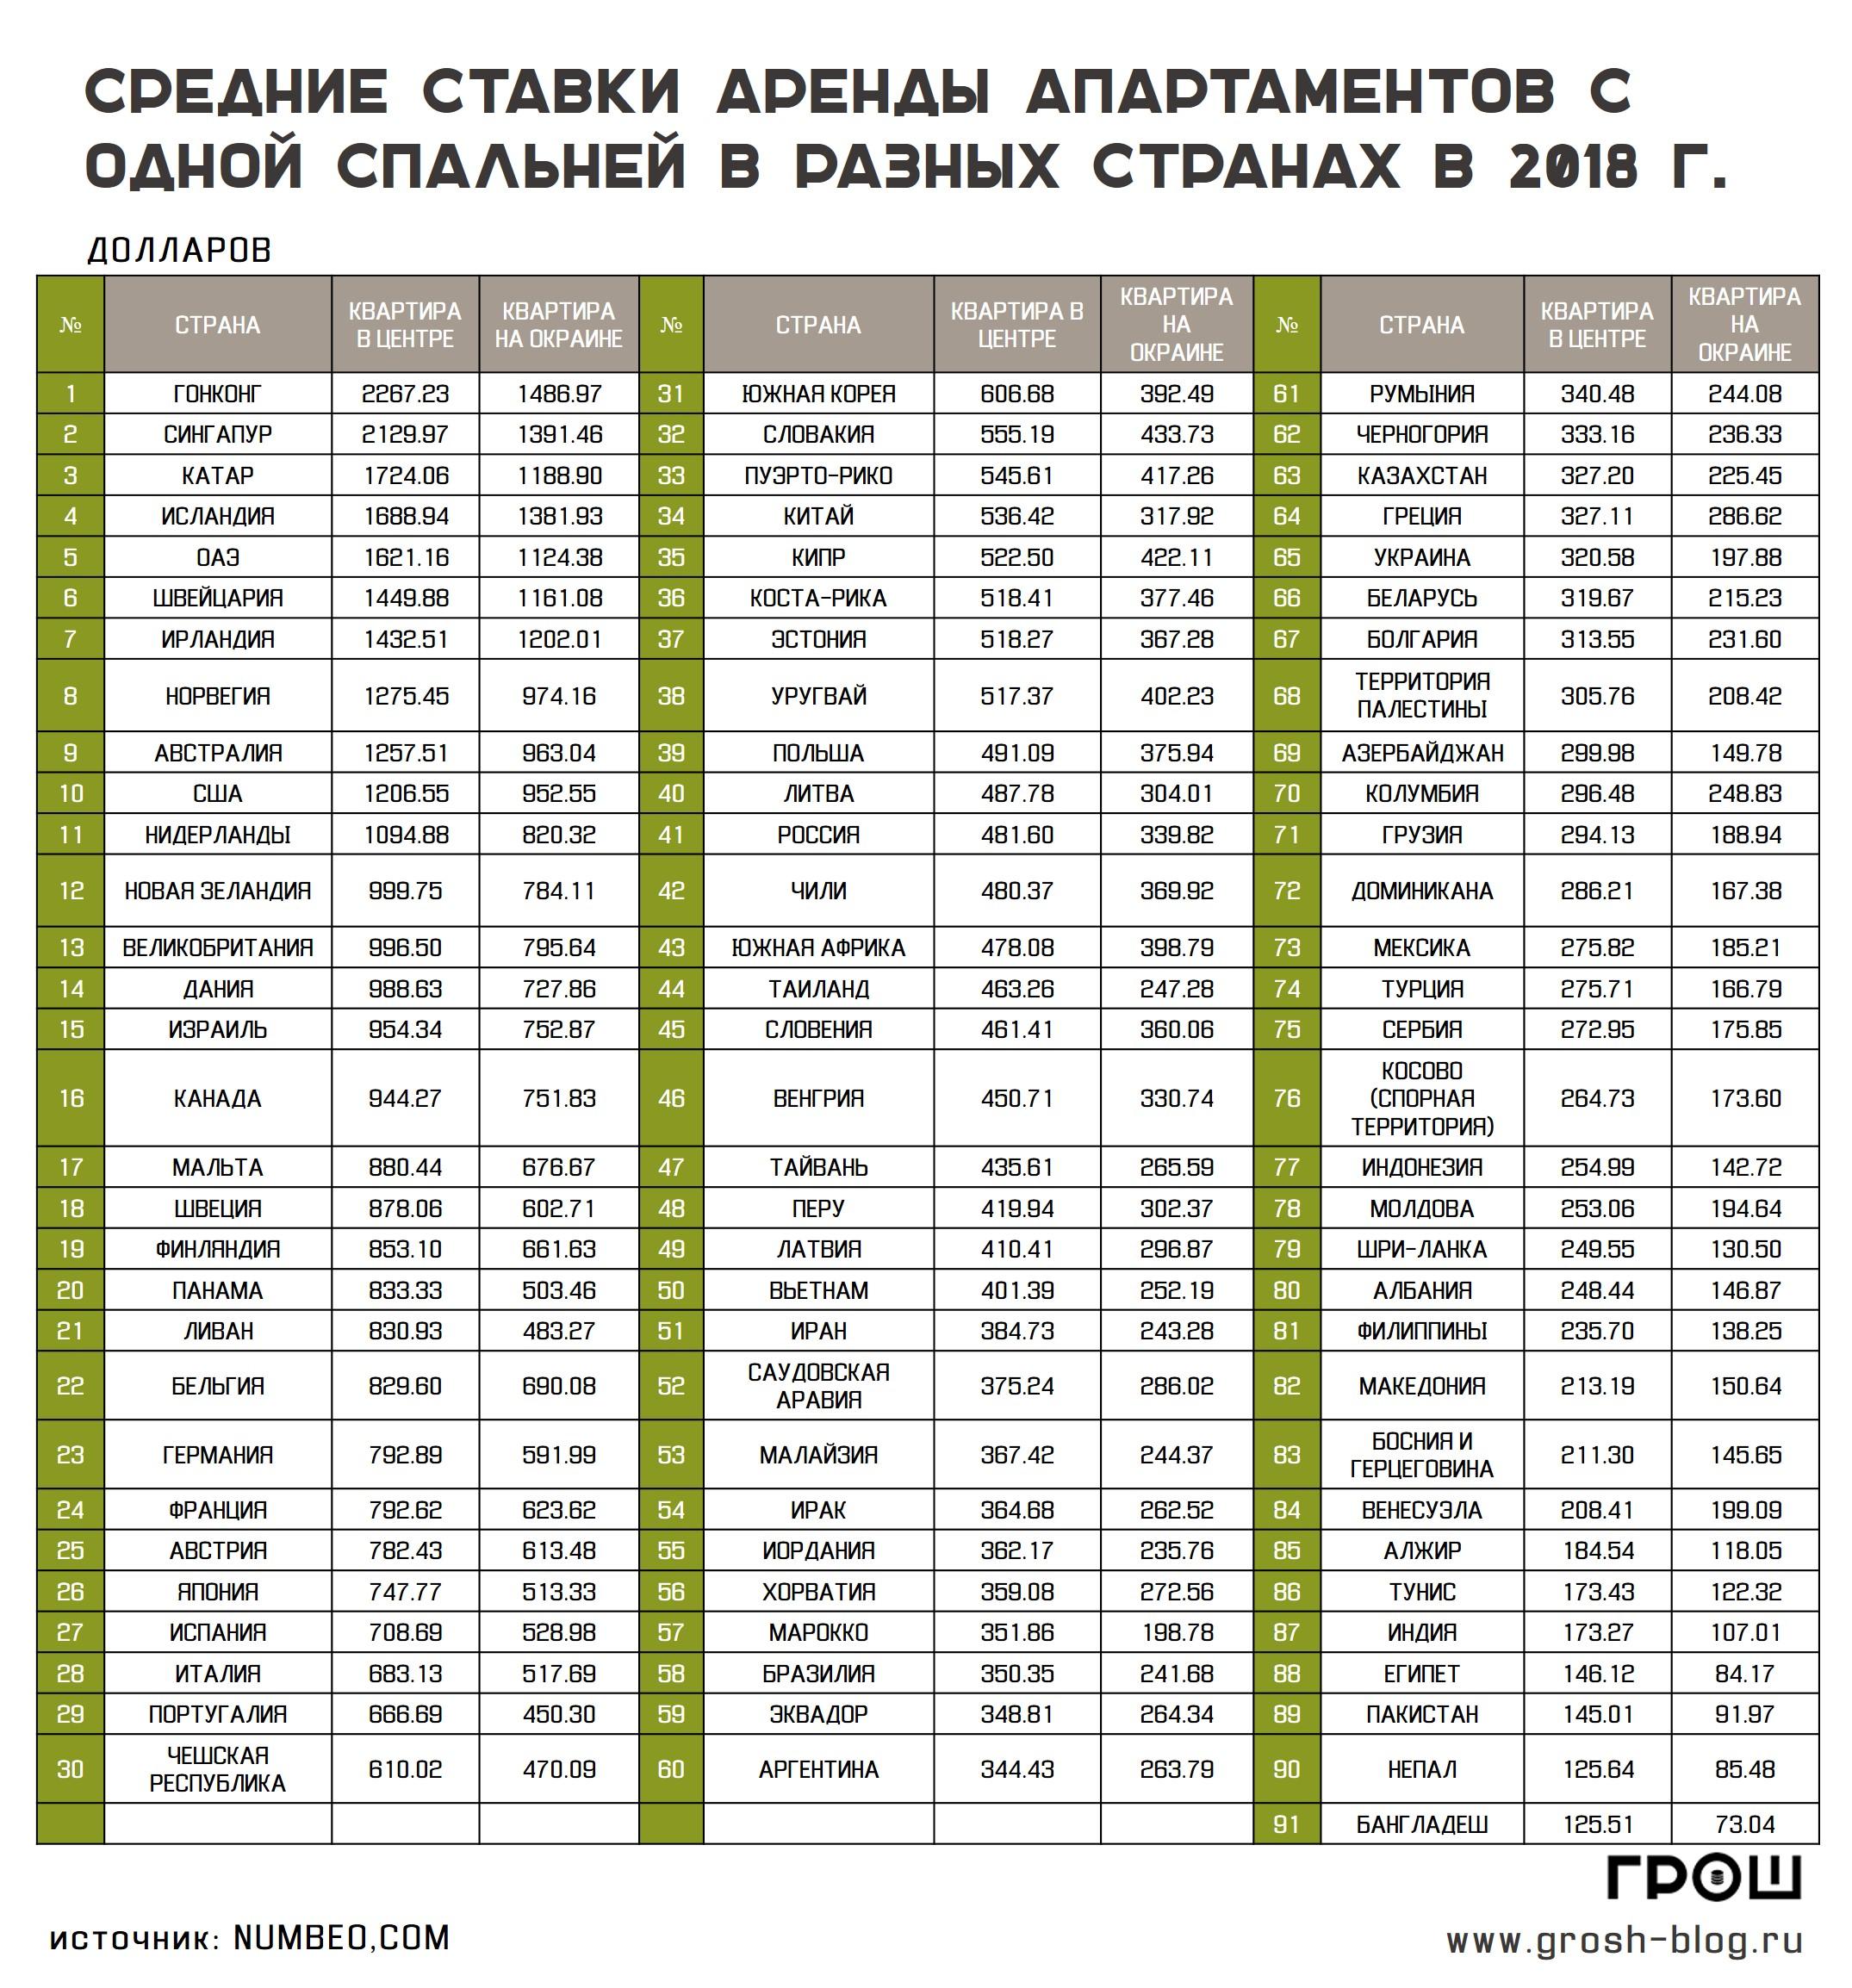 ставки аренды однокомнатных квартир в разных странах http://grosh-blog.ru